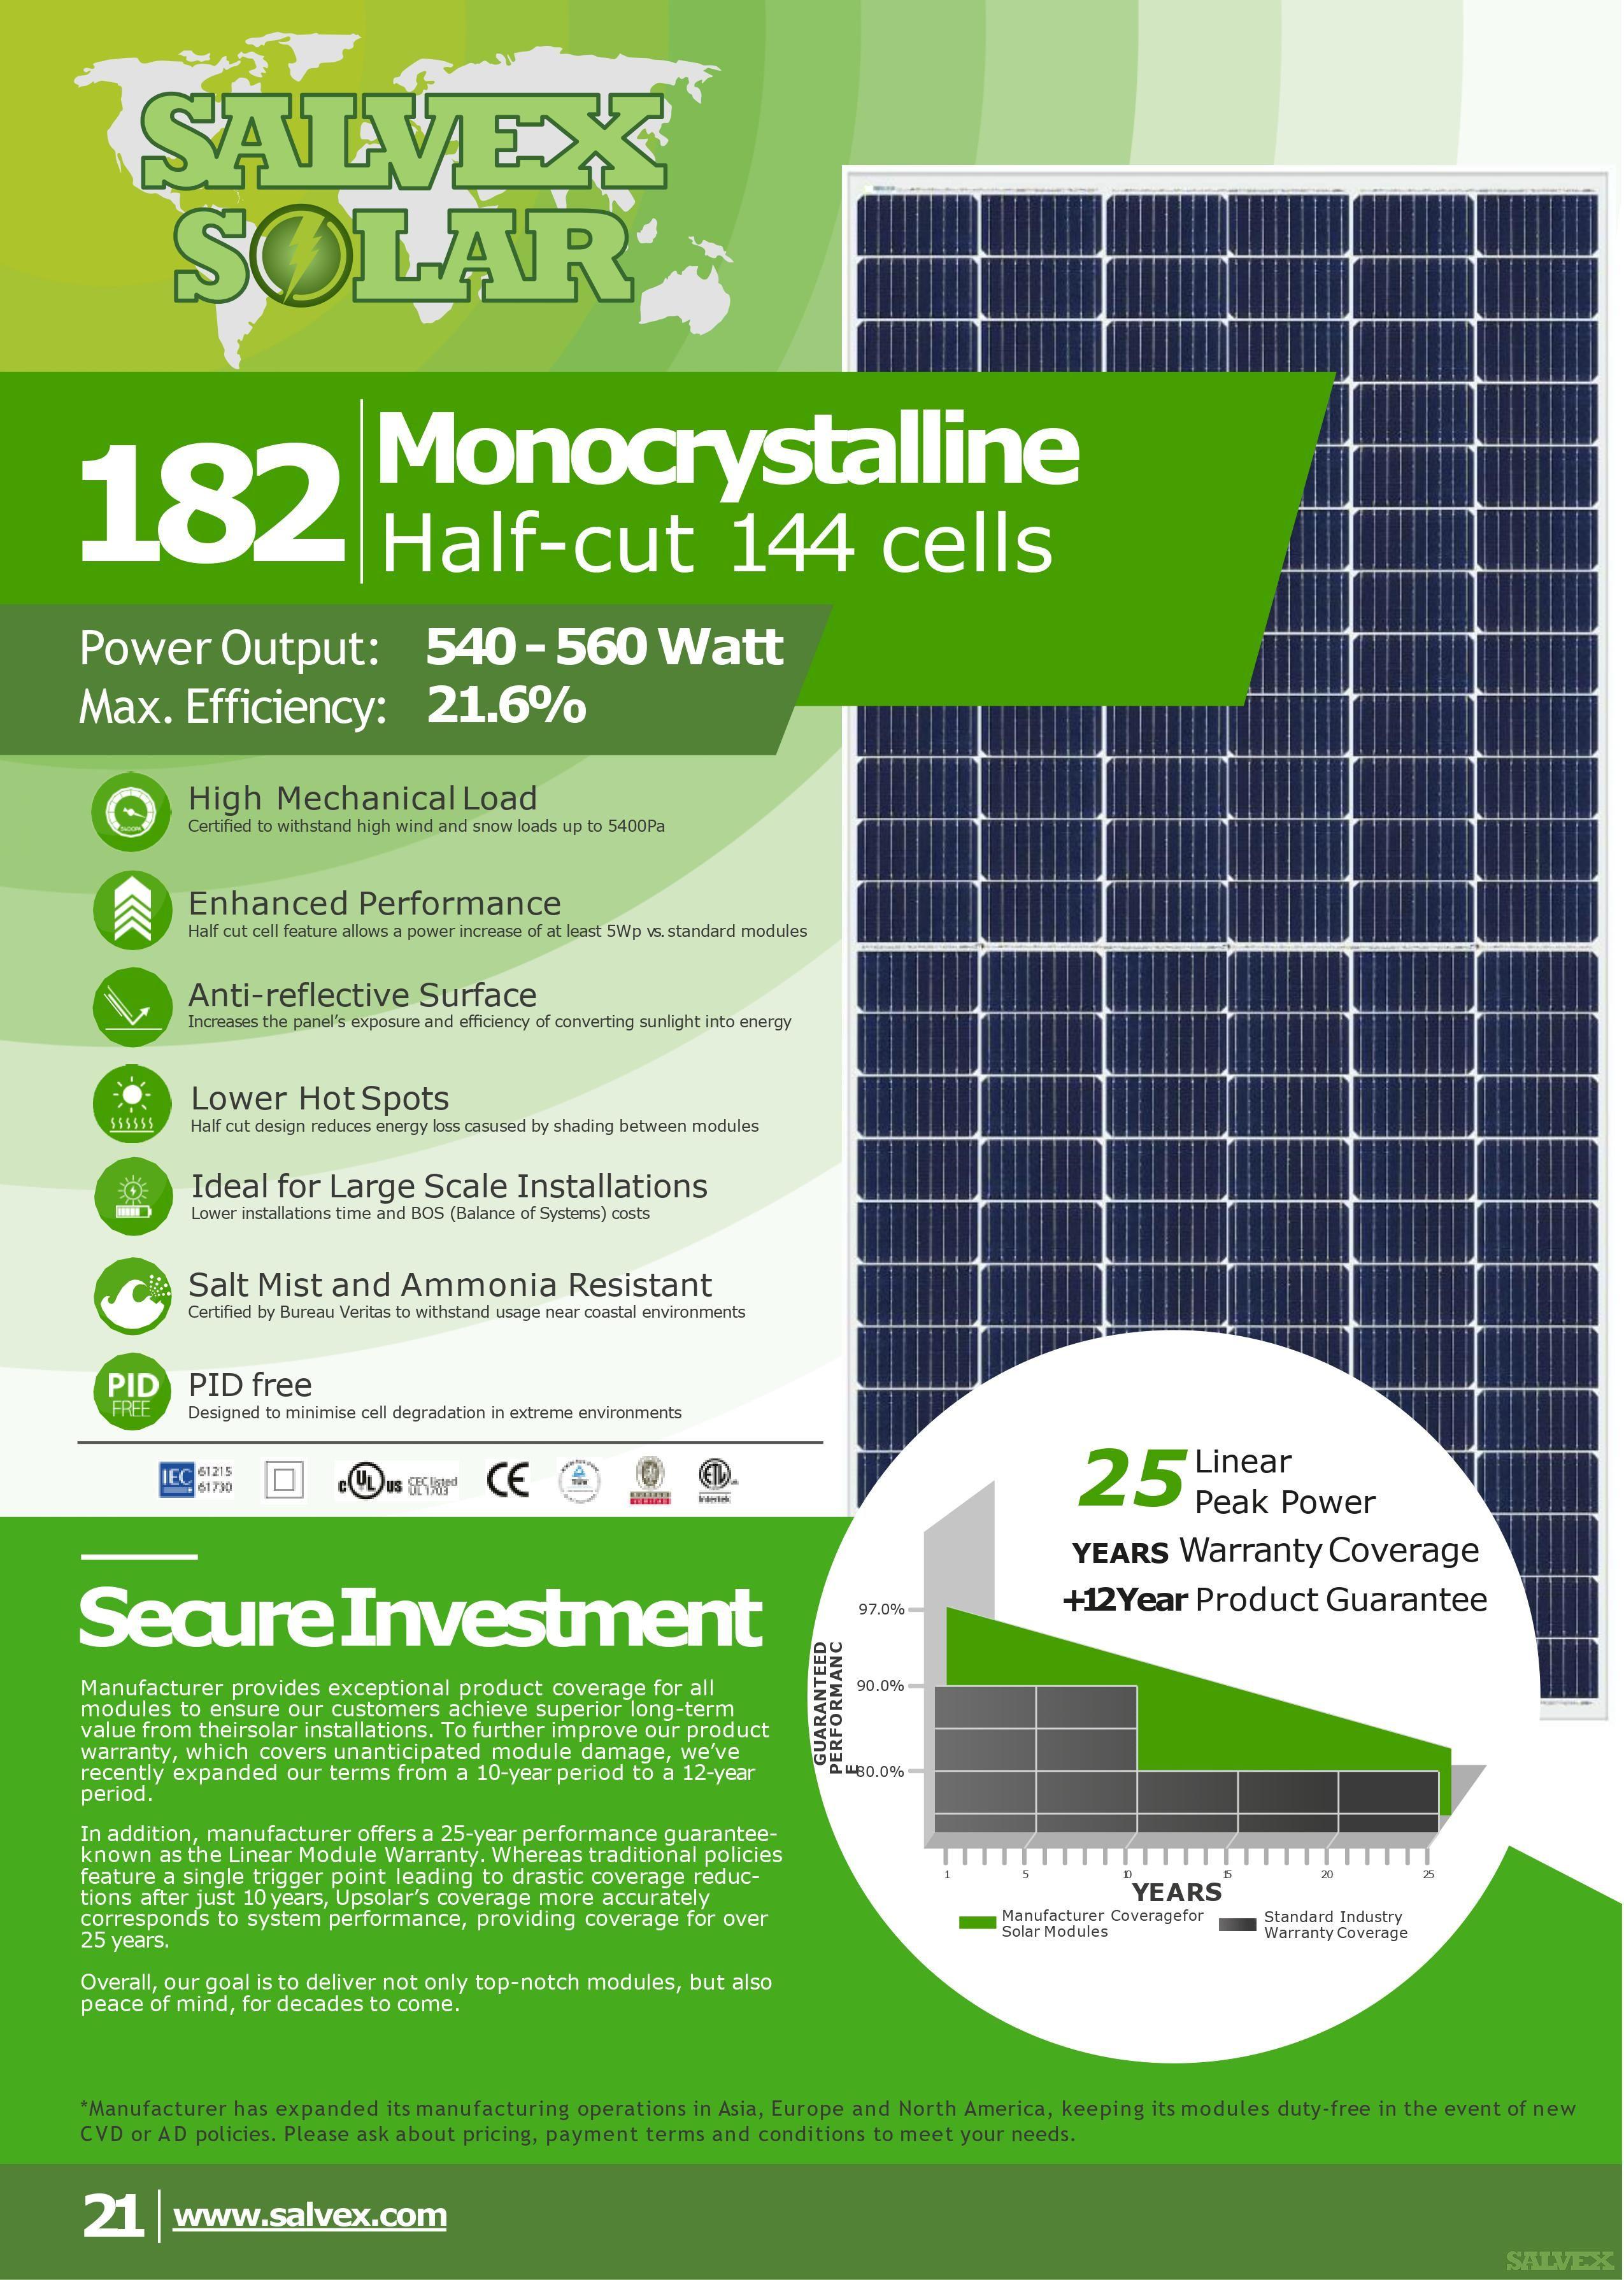 Salvex Solar 540W Monocrystalline PV Solar Panels (Minimum Order: 1 x 40HQ Container)